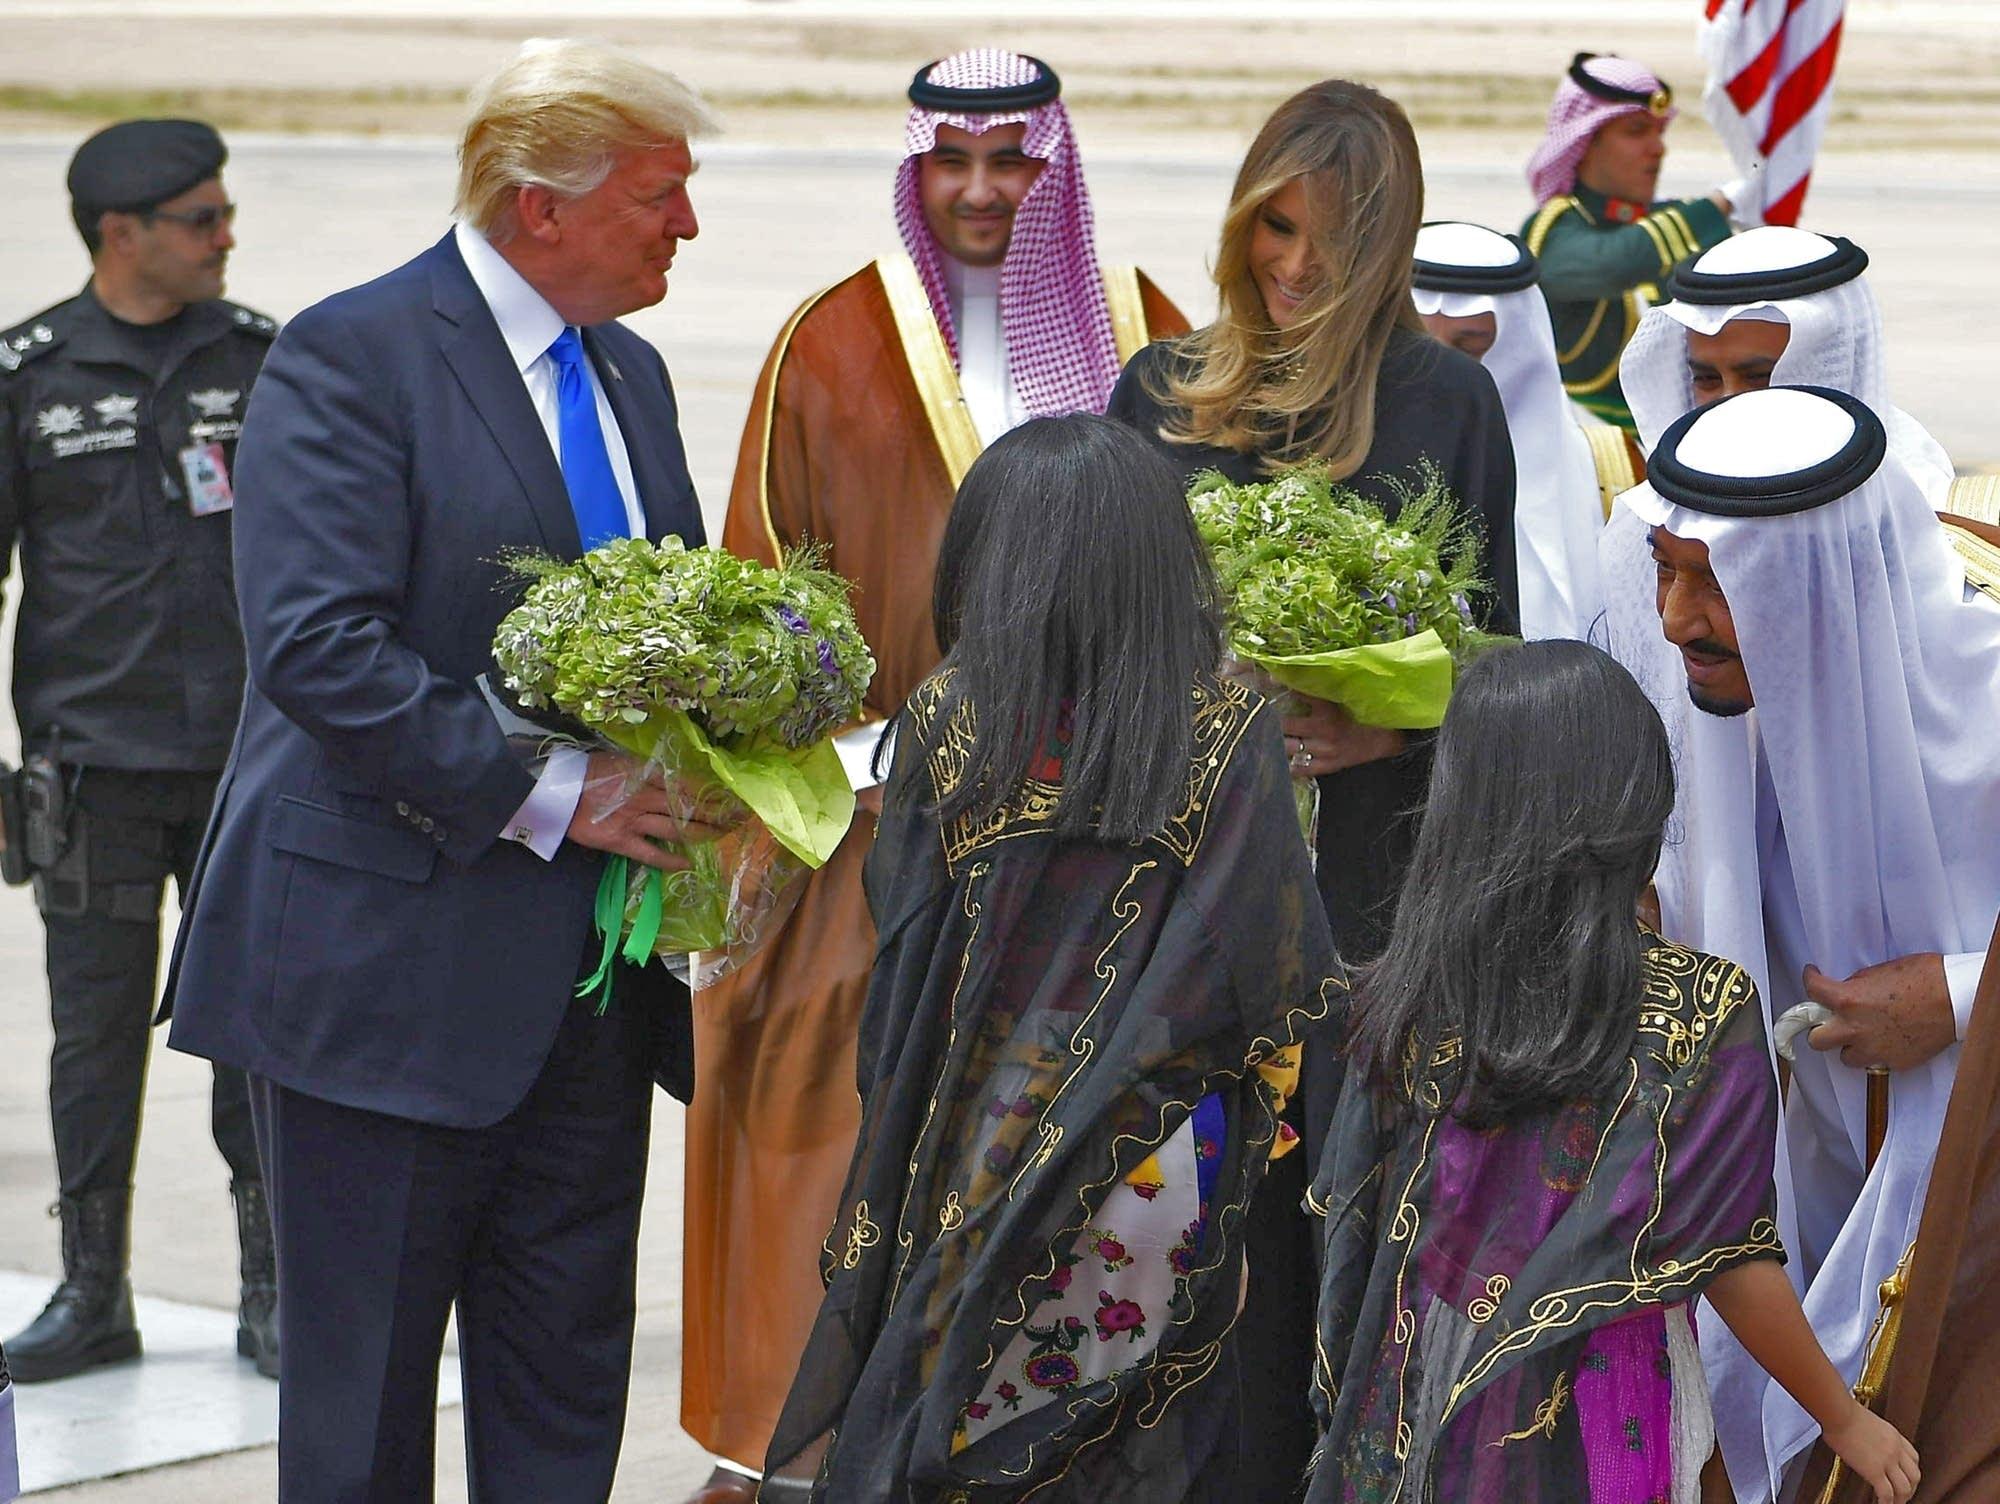 President Donald Trump and First Lady Melania Trump arrive in Saudi Arabia